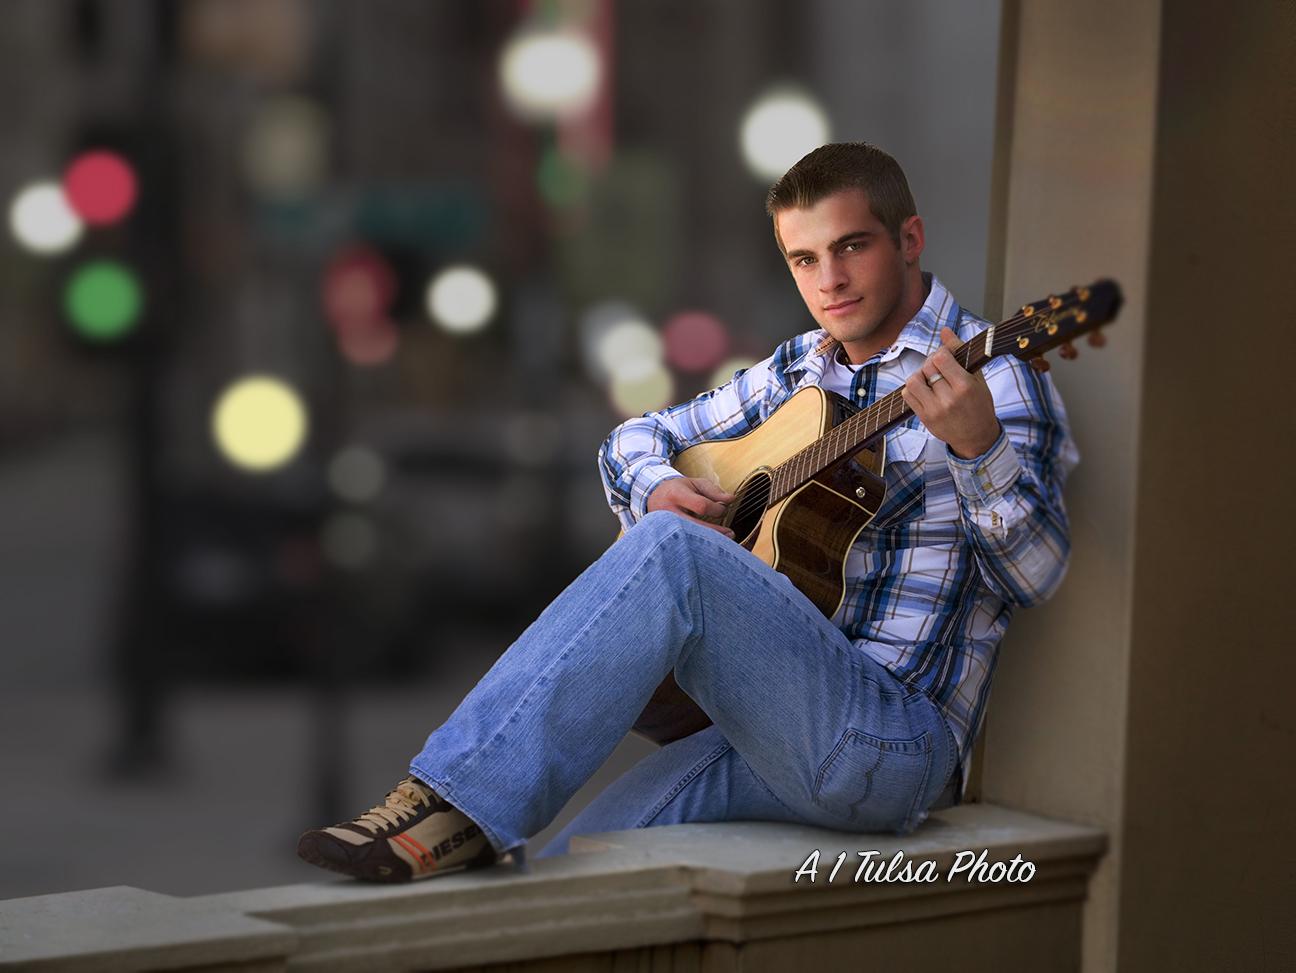 Tulsa senior boy pictures